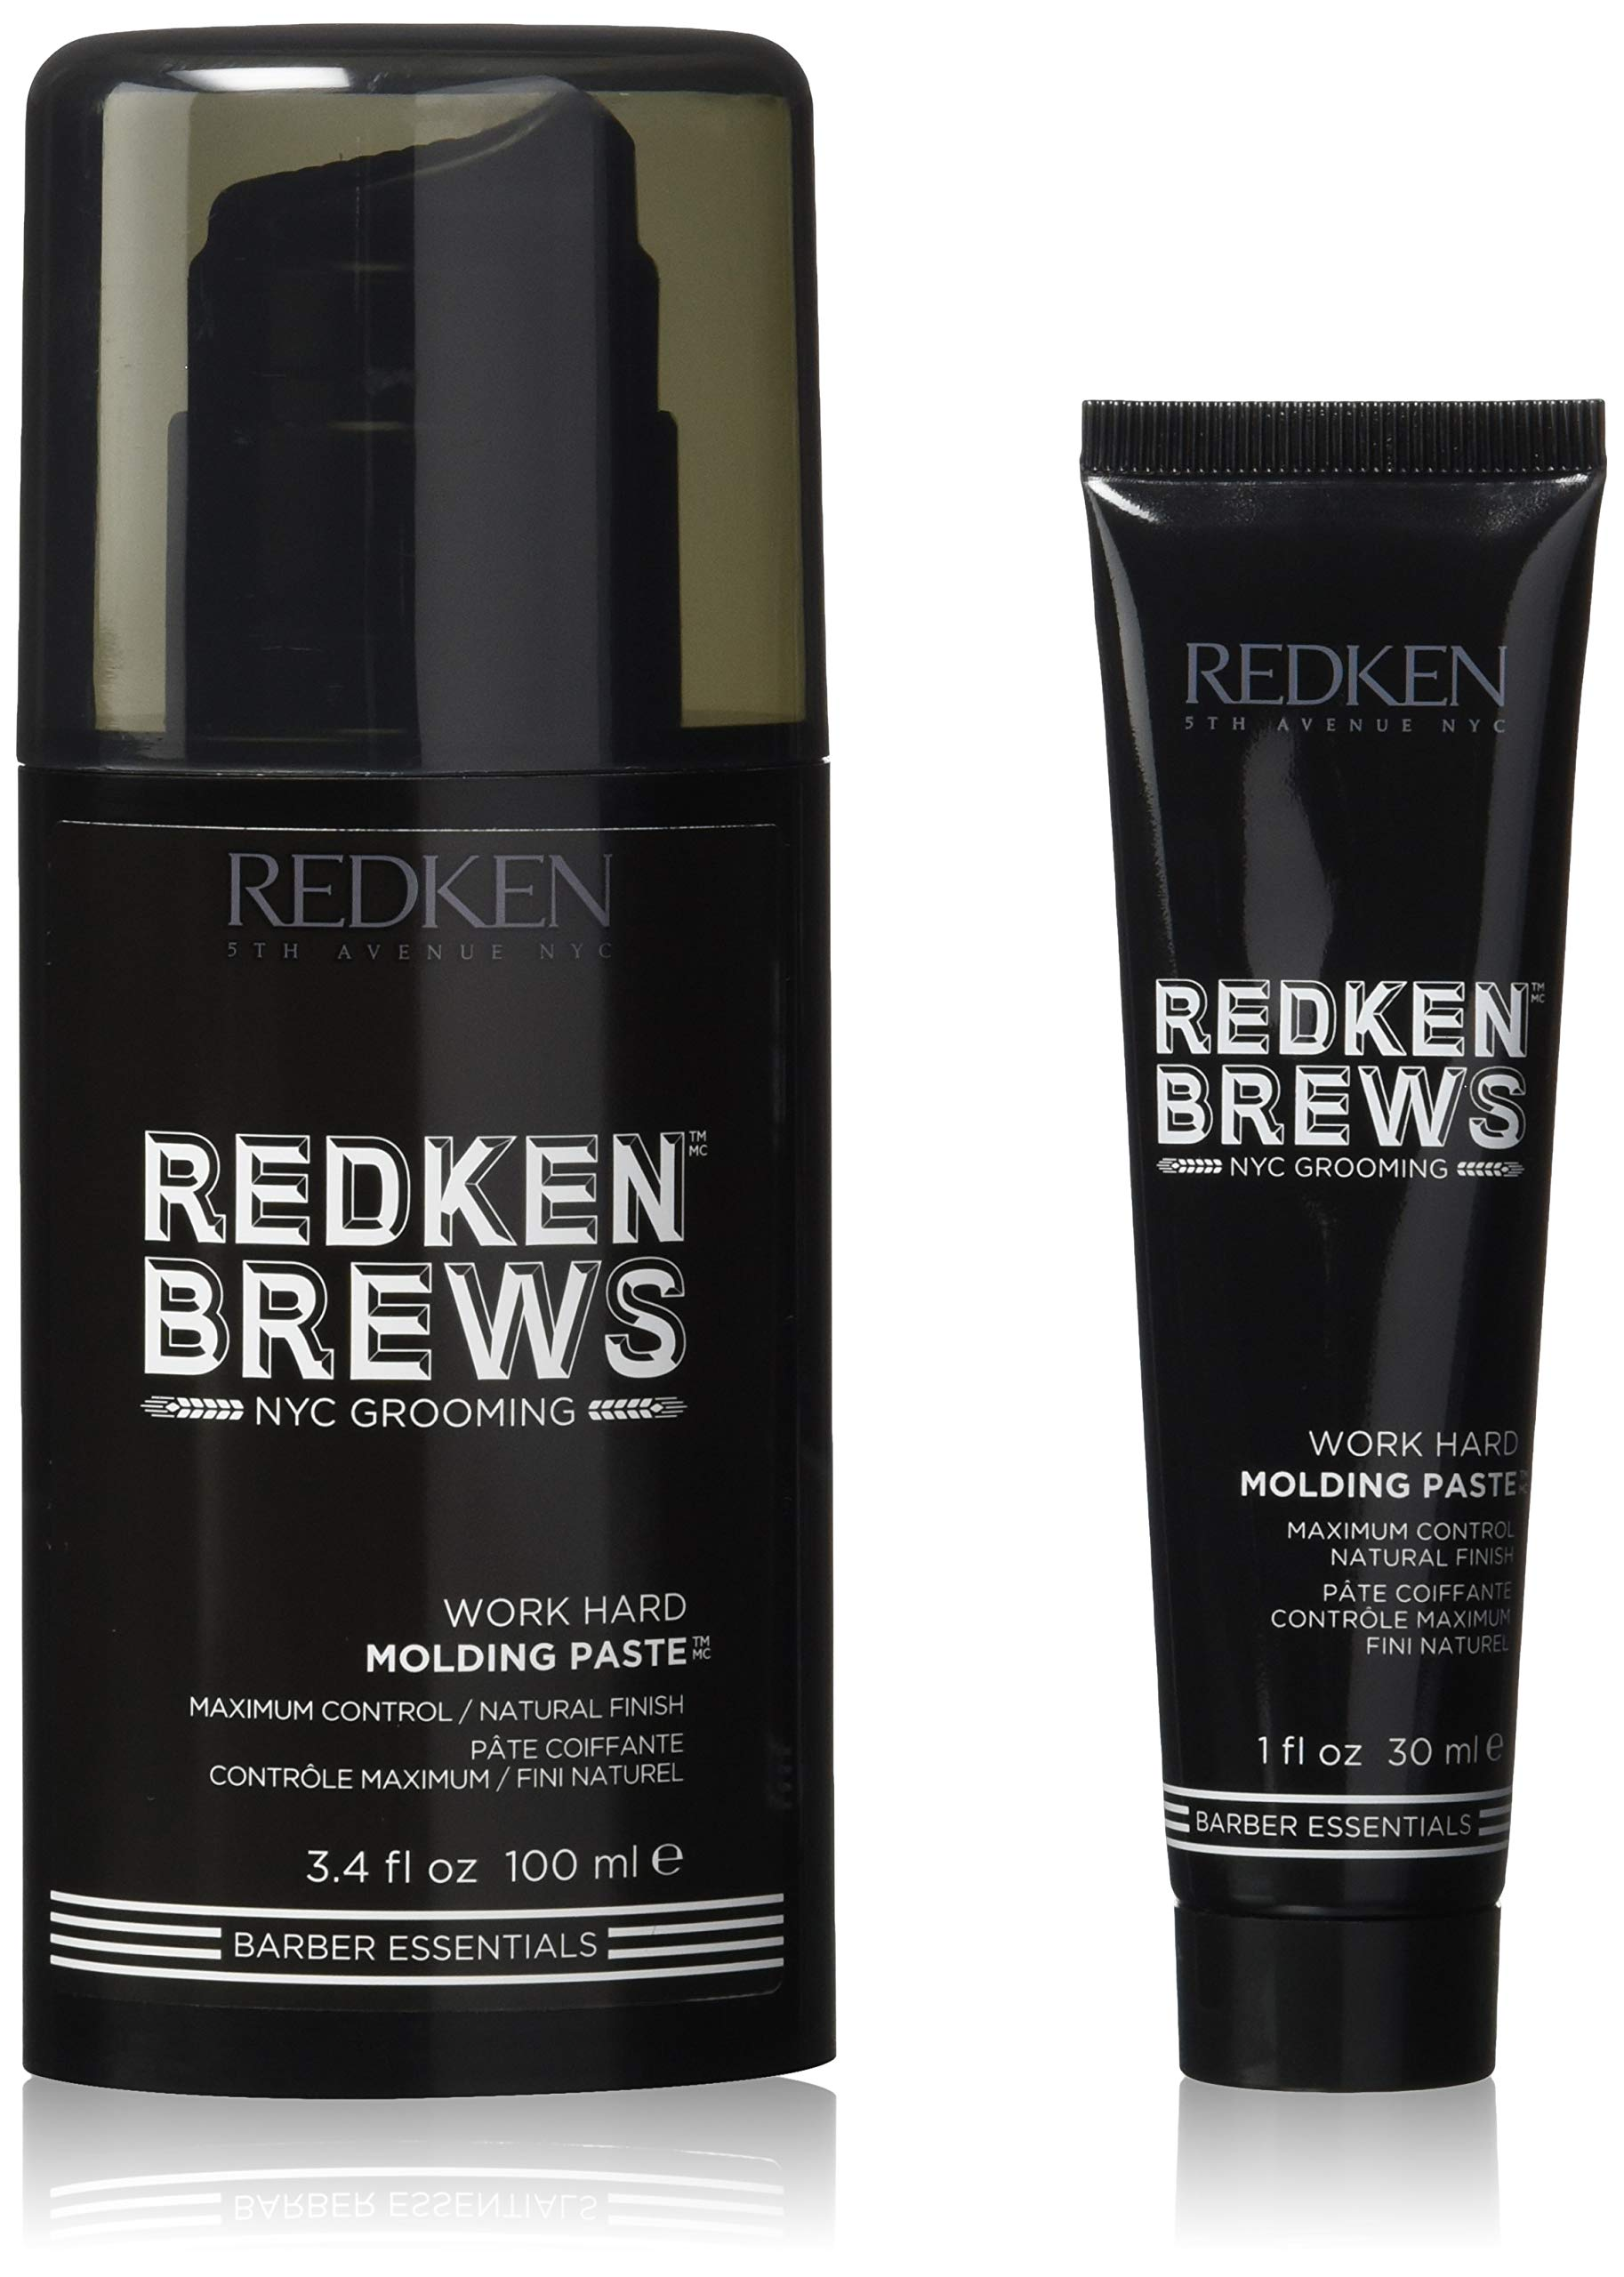 Redken Brews Molding Paste For Men, High Hold, Natural Finish, 3.4 fl. oz. with free mini by Redken Brews